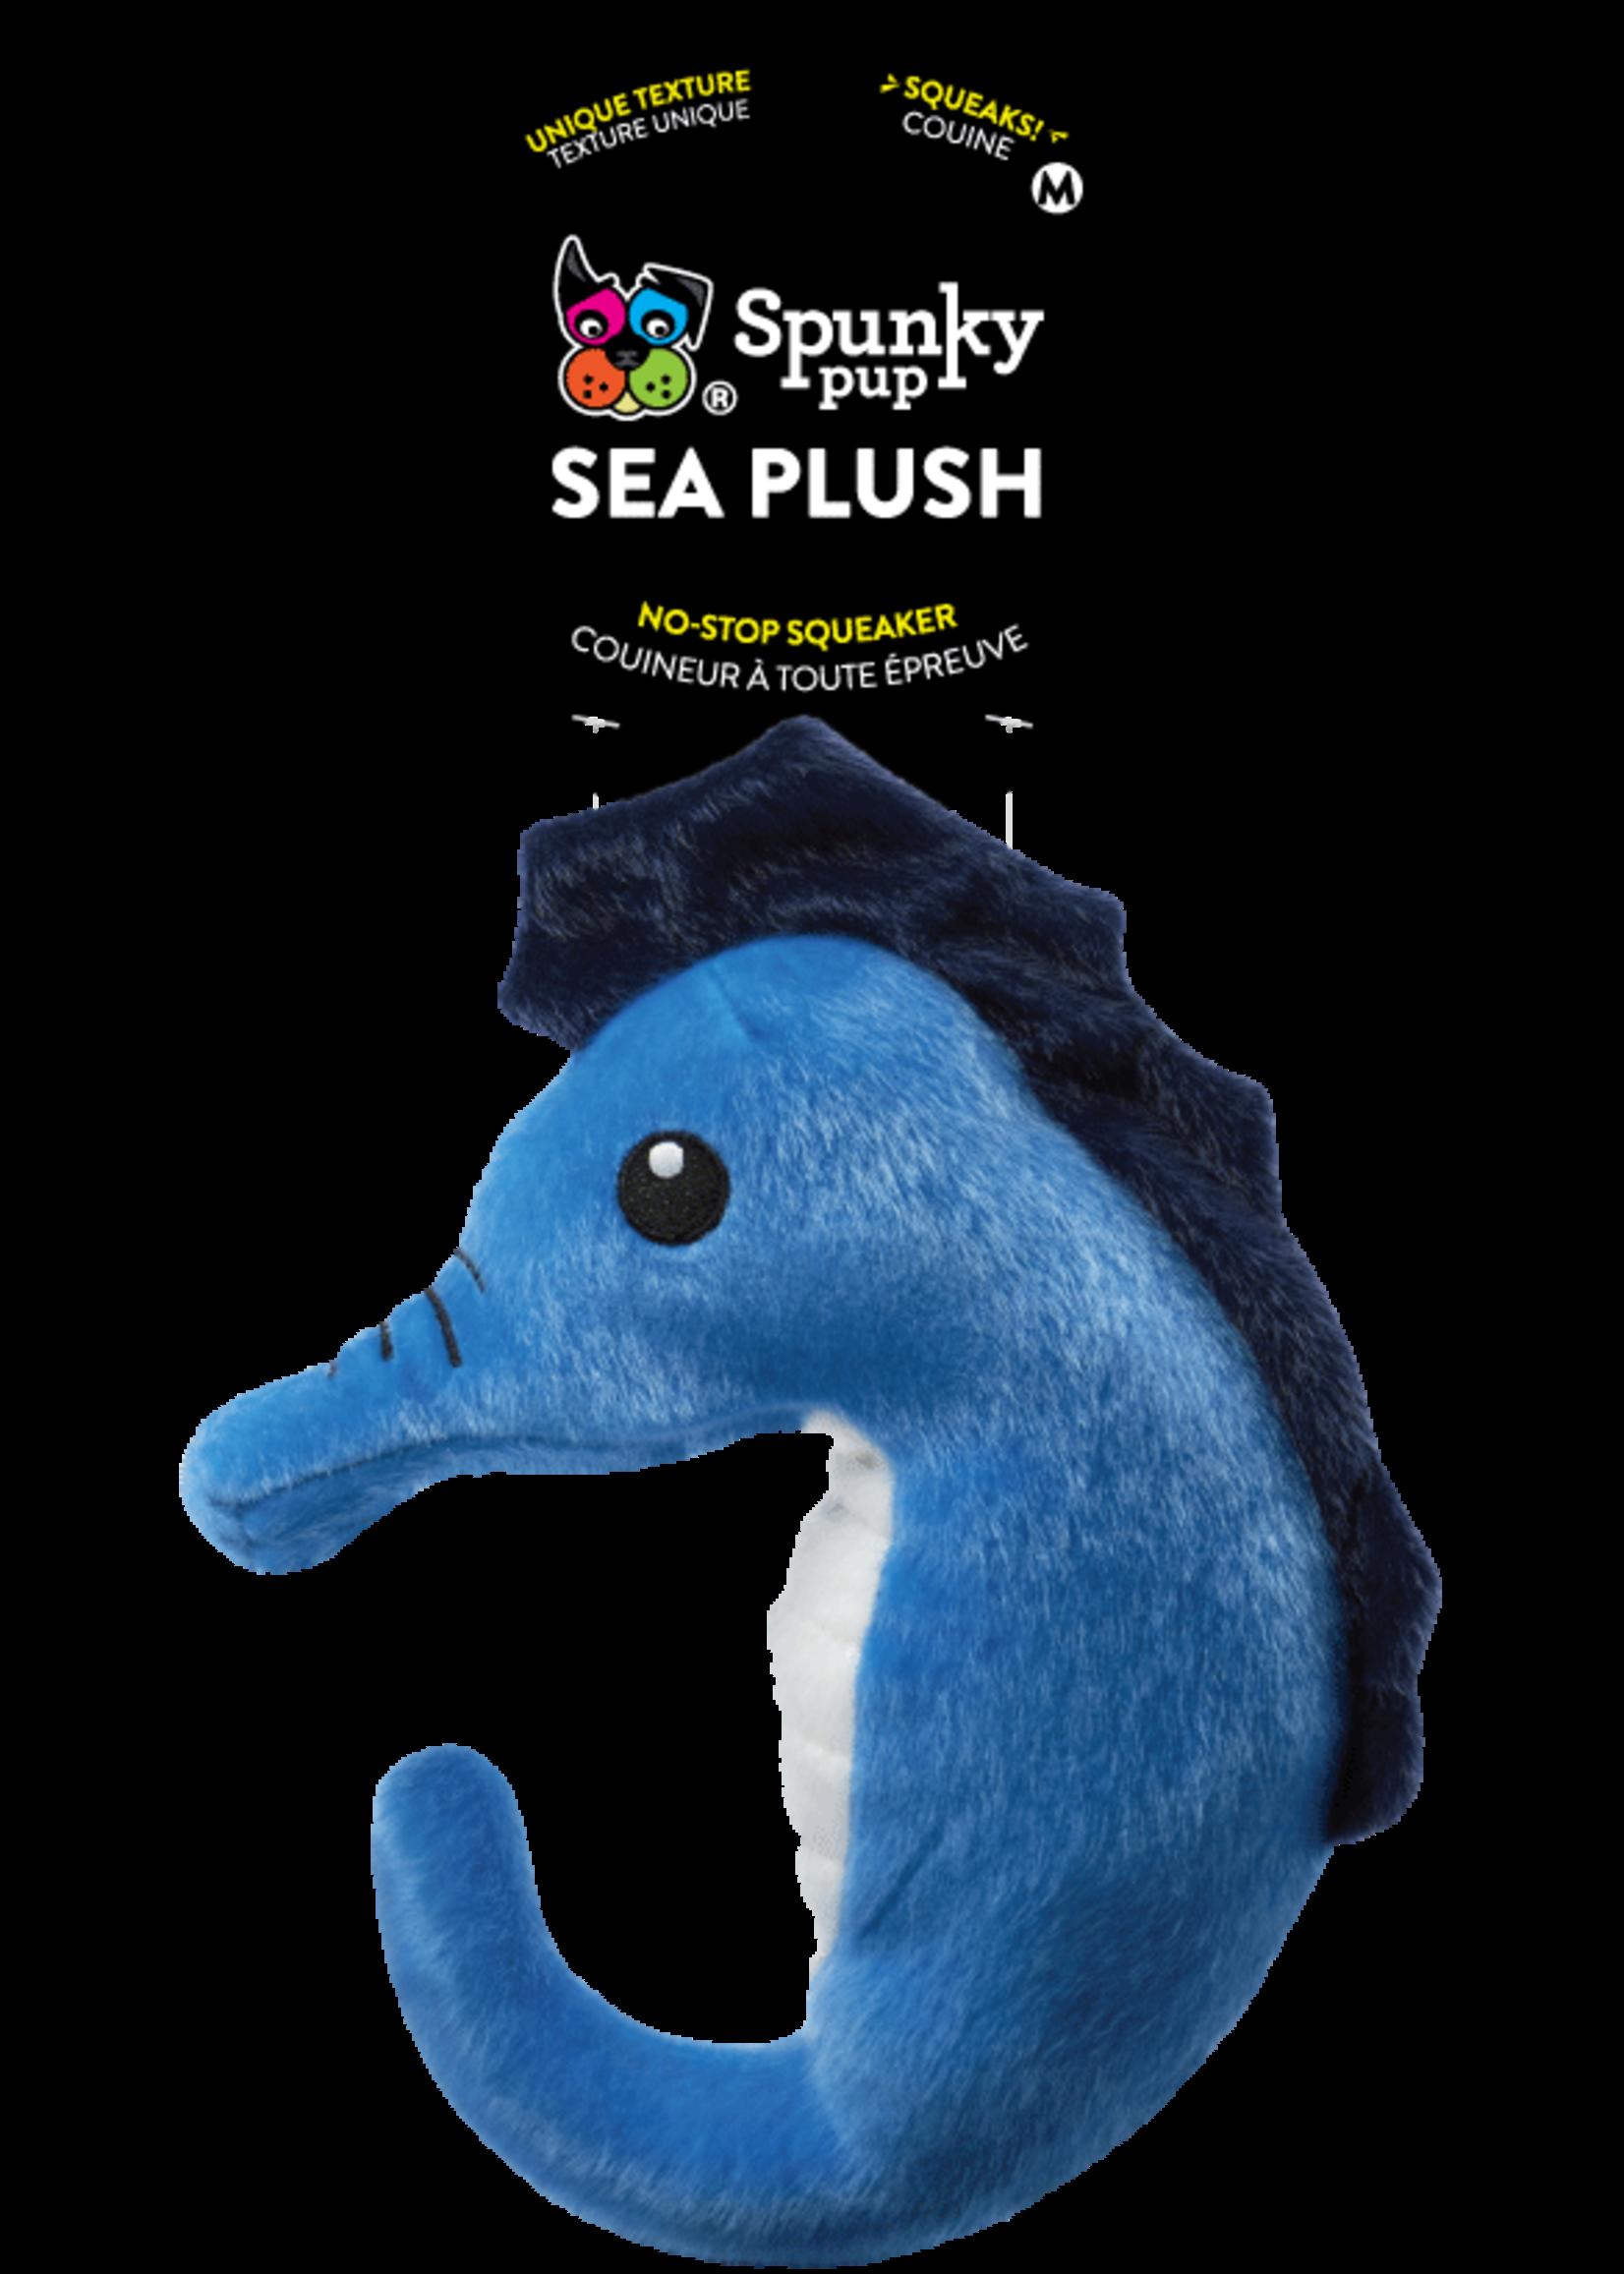 Spunky Pup Spunky Pup Sea Plush Seahorse Large